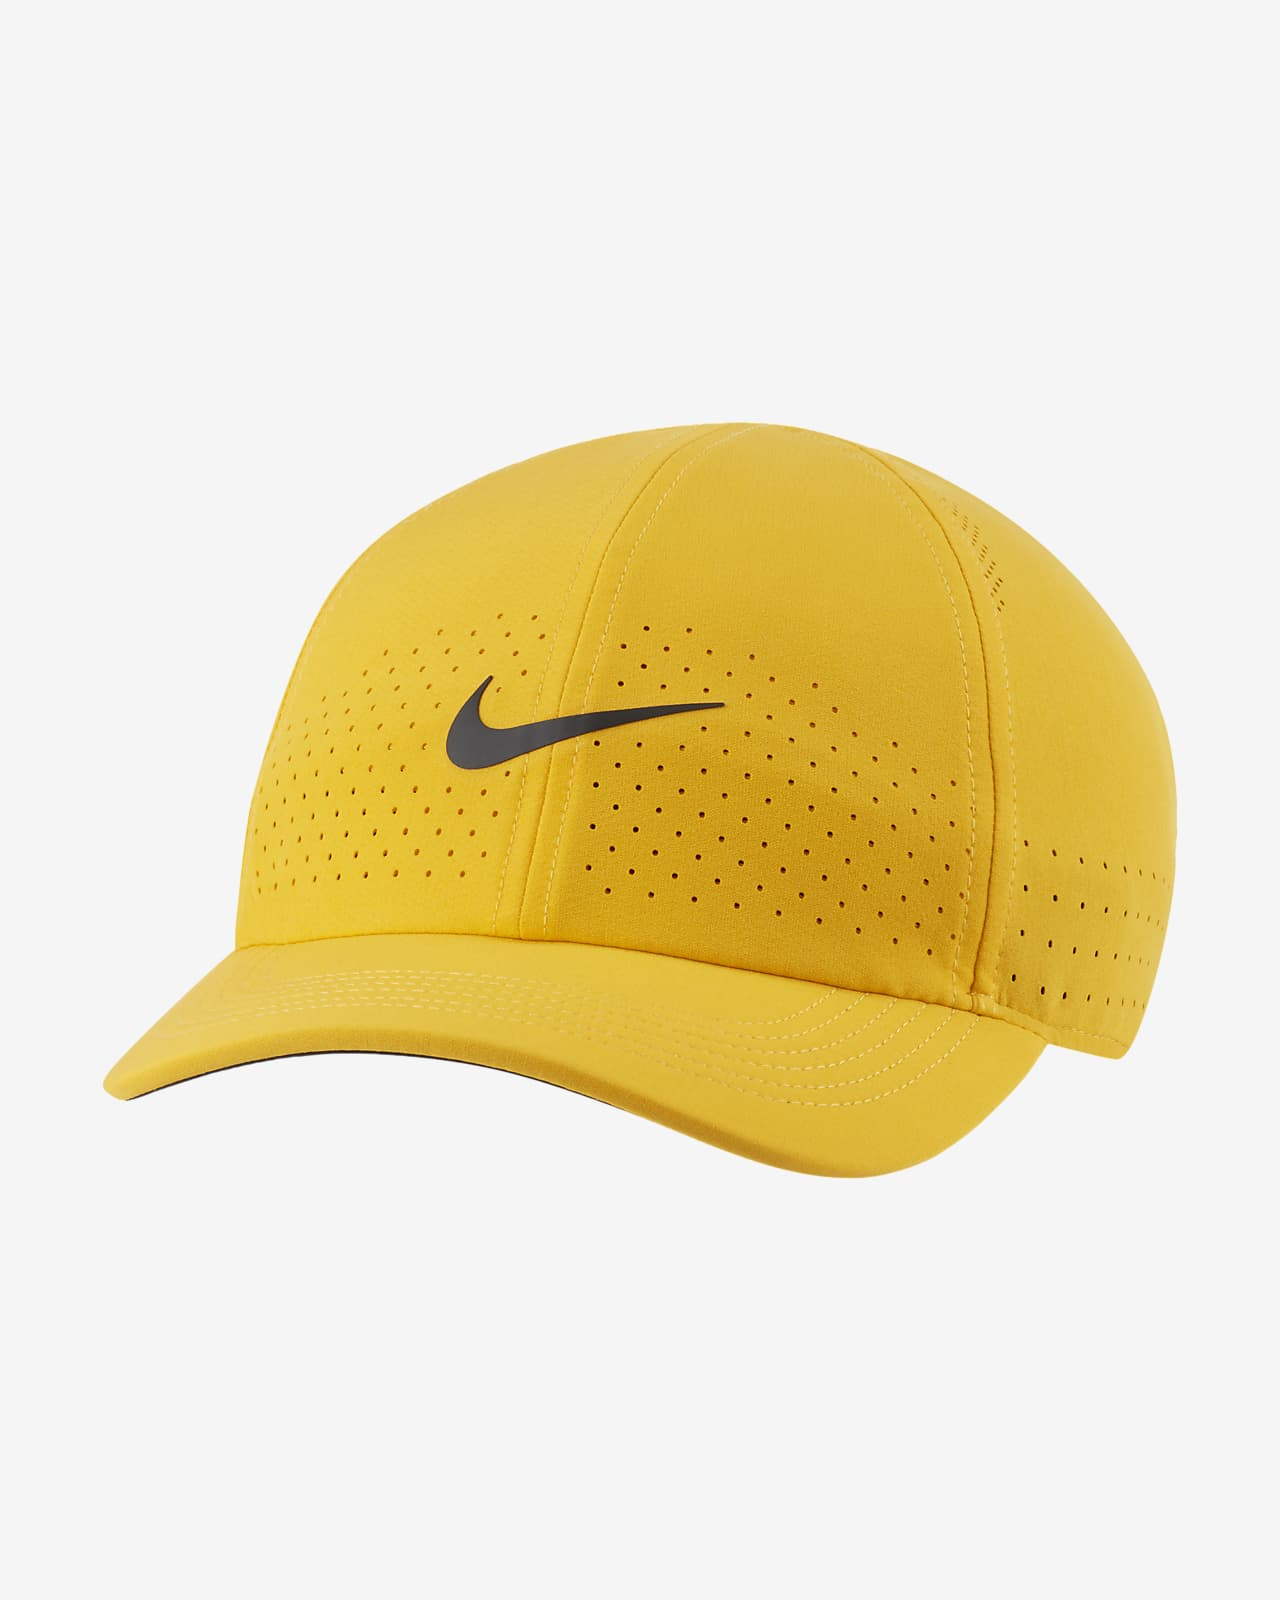 Casquette de tennis NikeCourt AeroBill Advantage